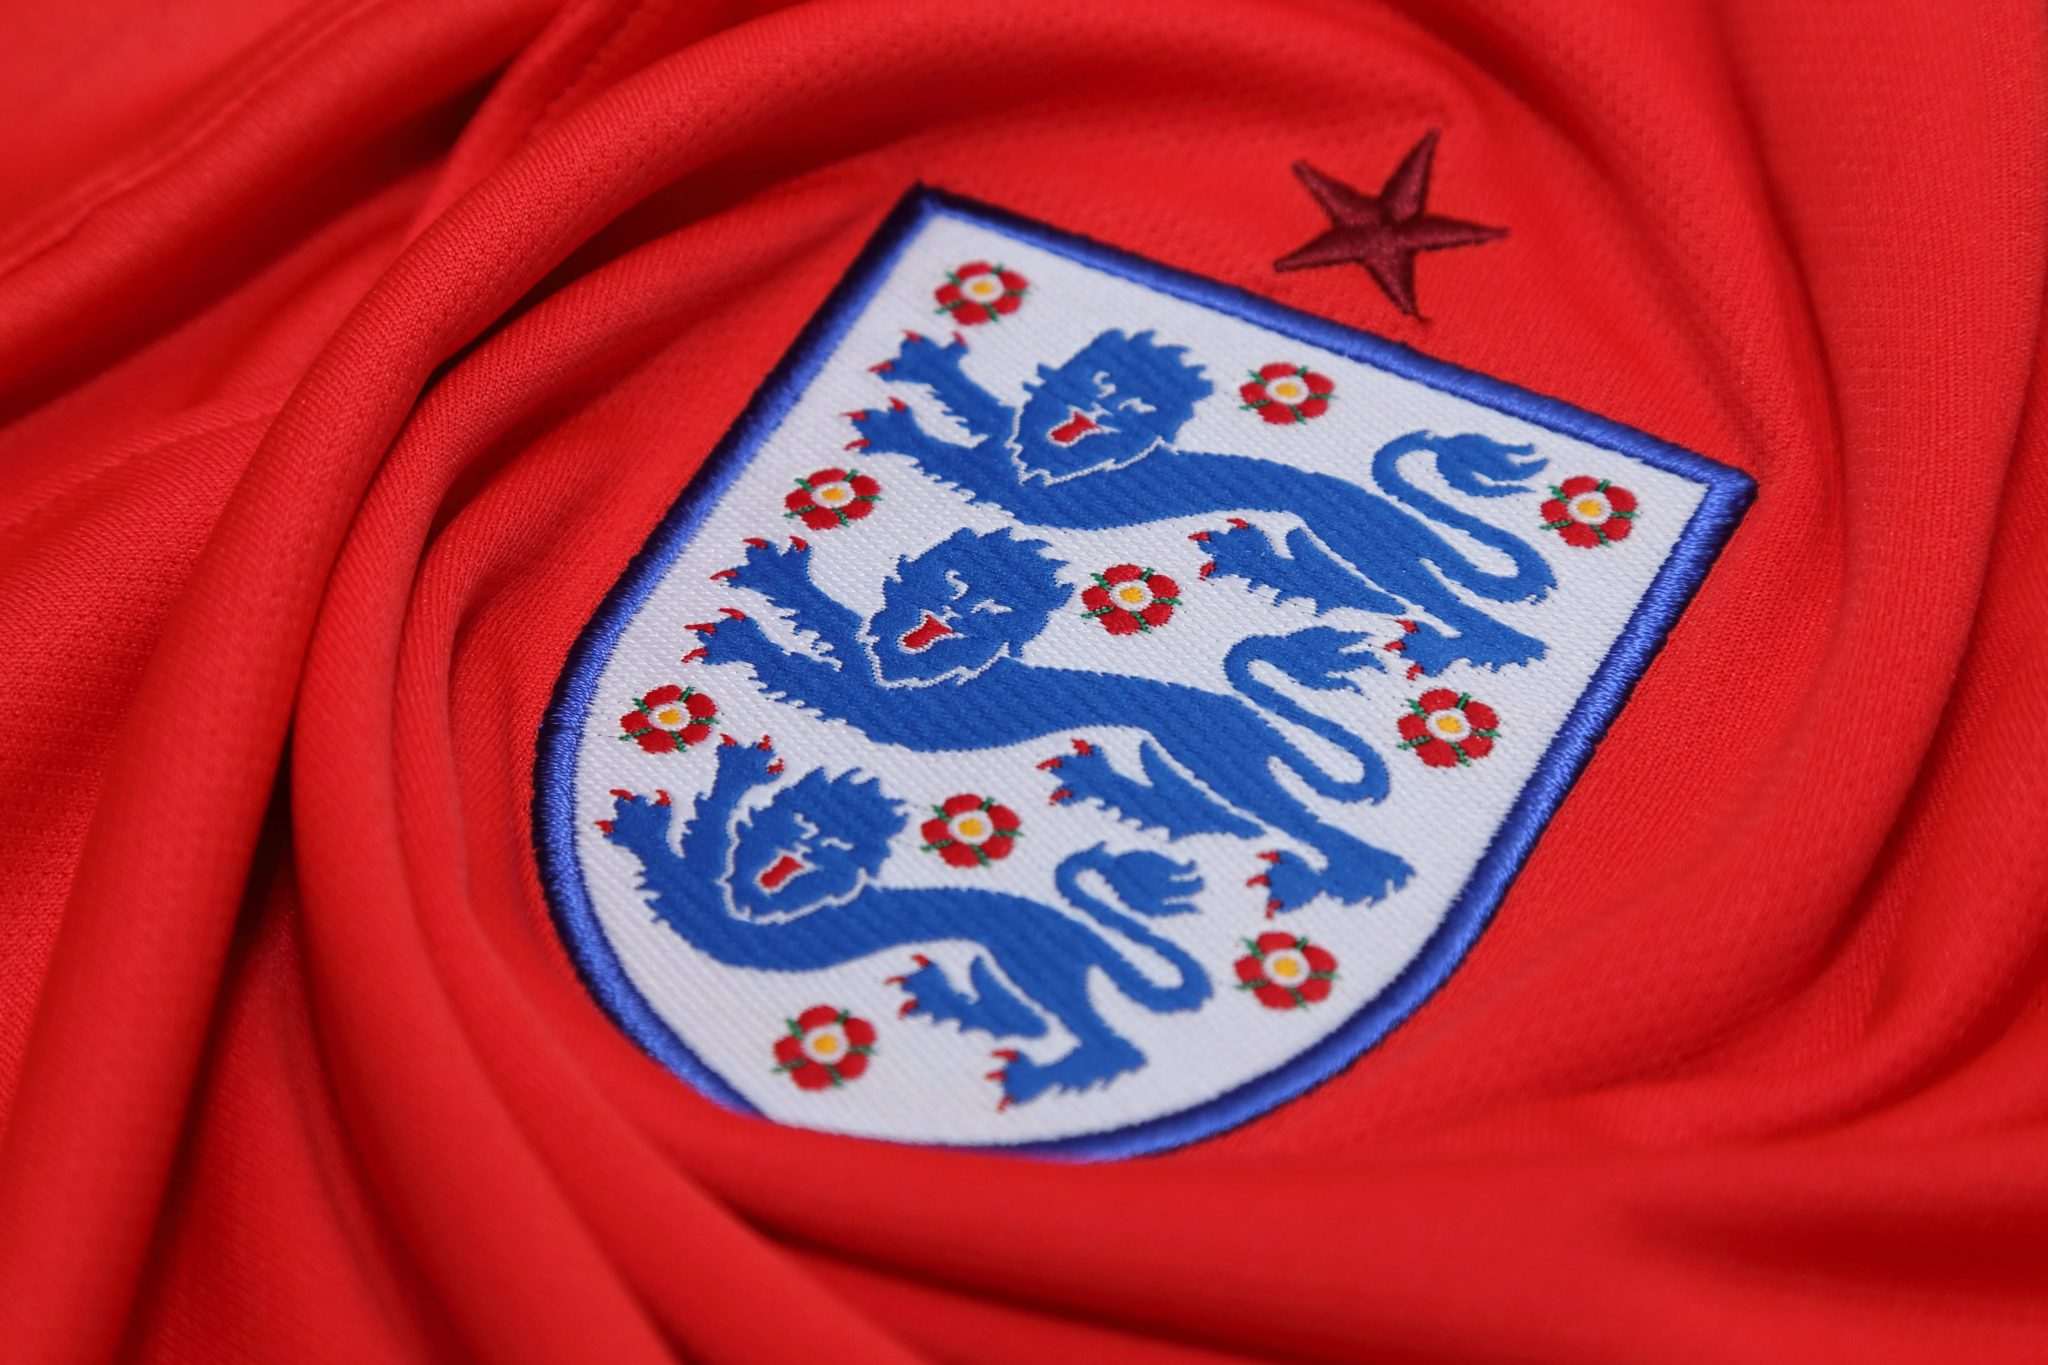 England 3 Lions image